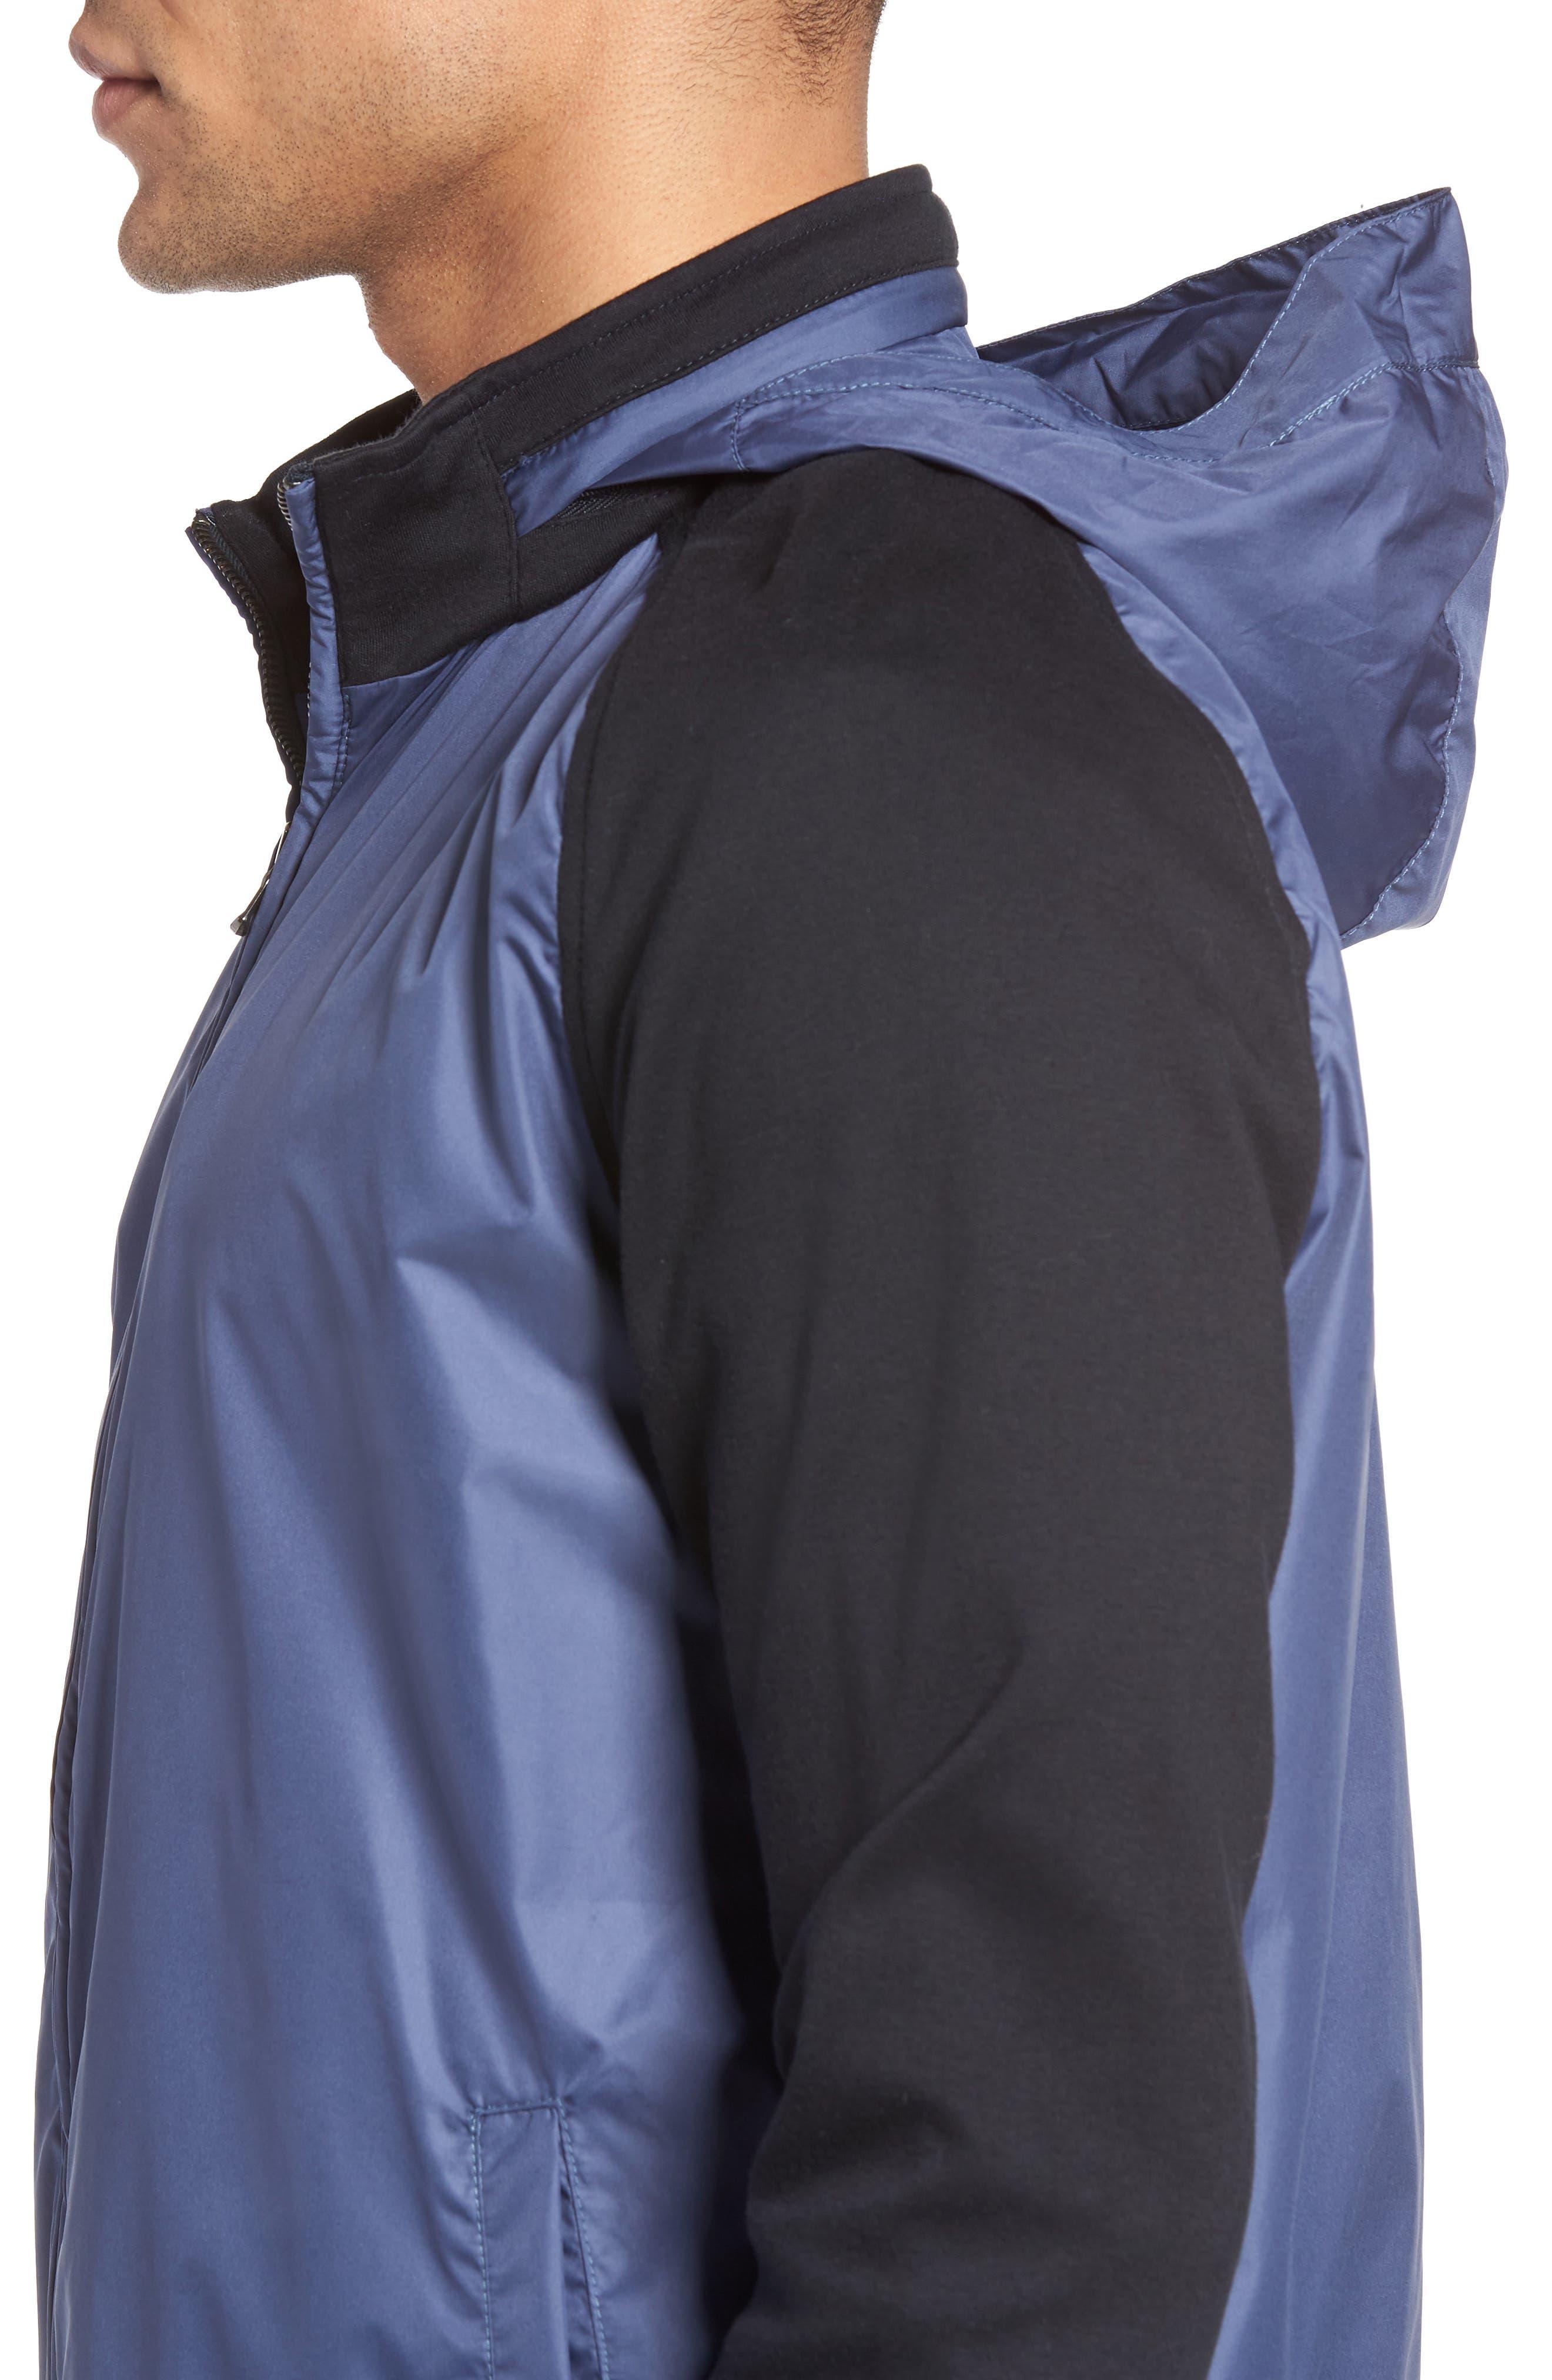 Syconium Mixed Media Zip Front Jacket,                             Alternate thumbnail 4, color,                             400